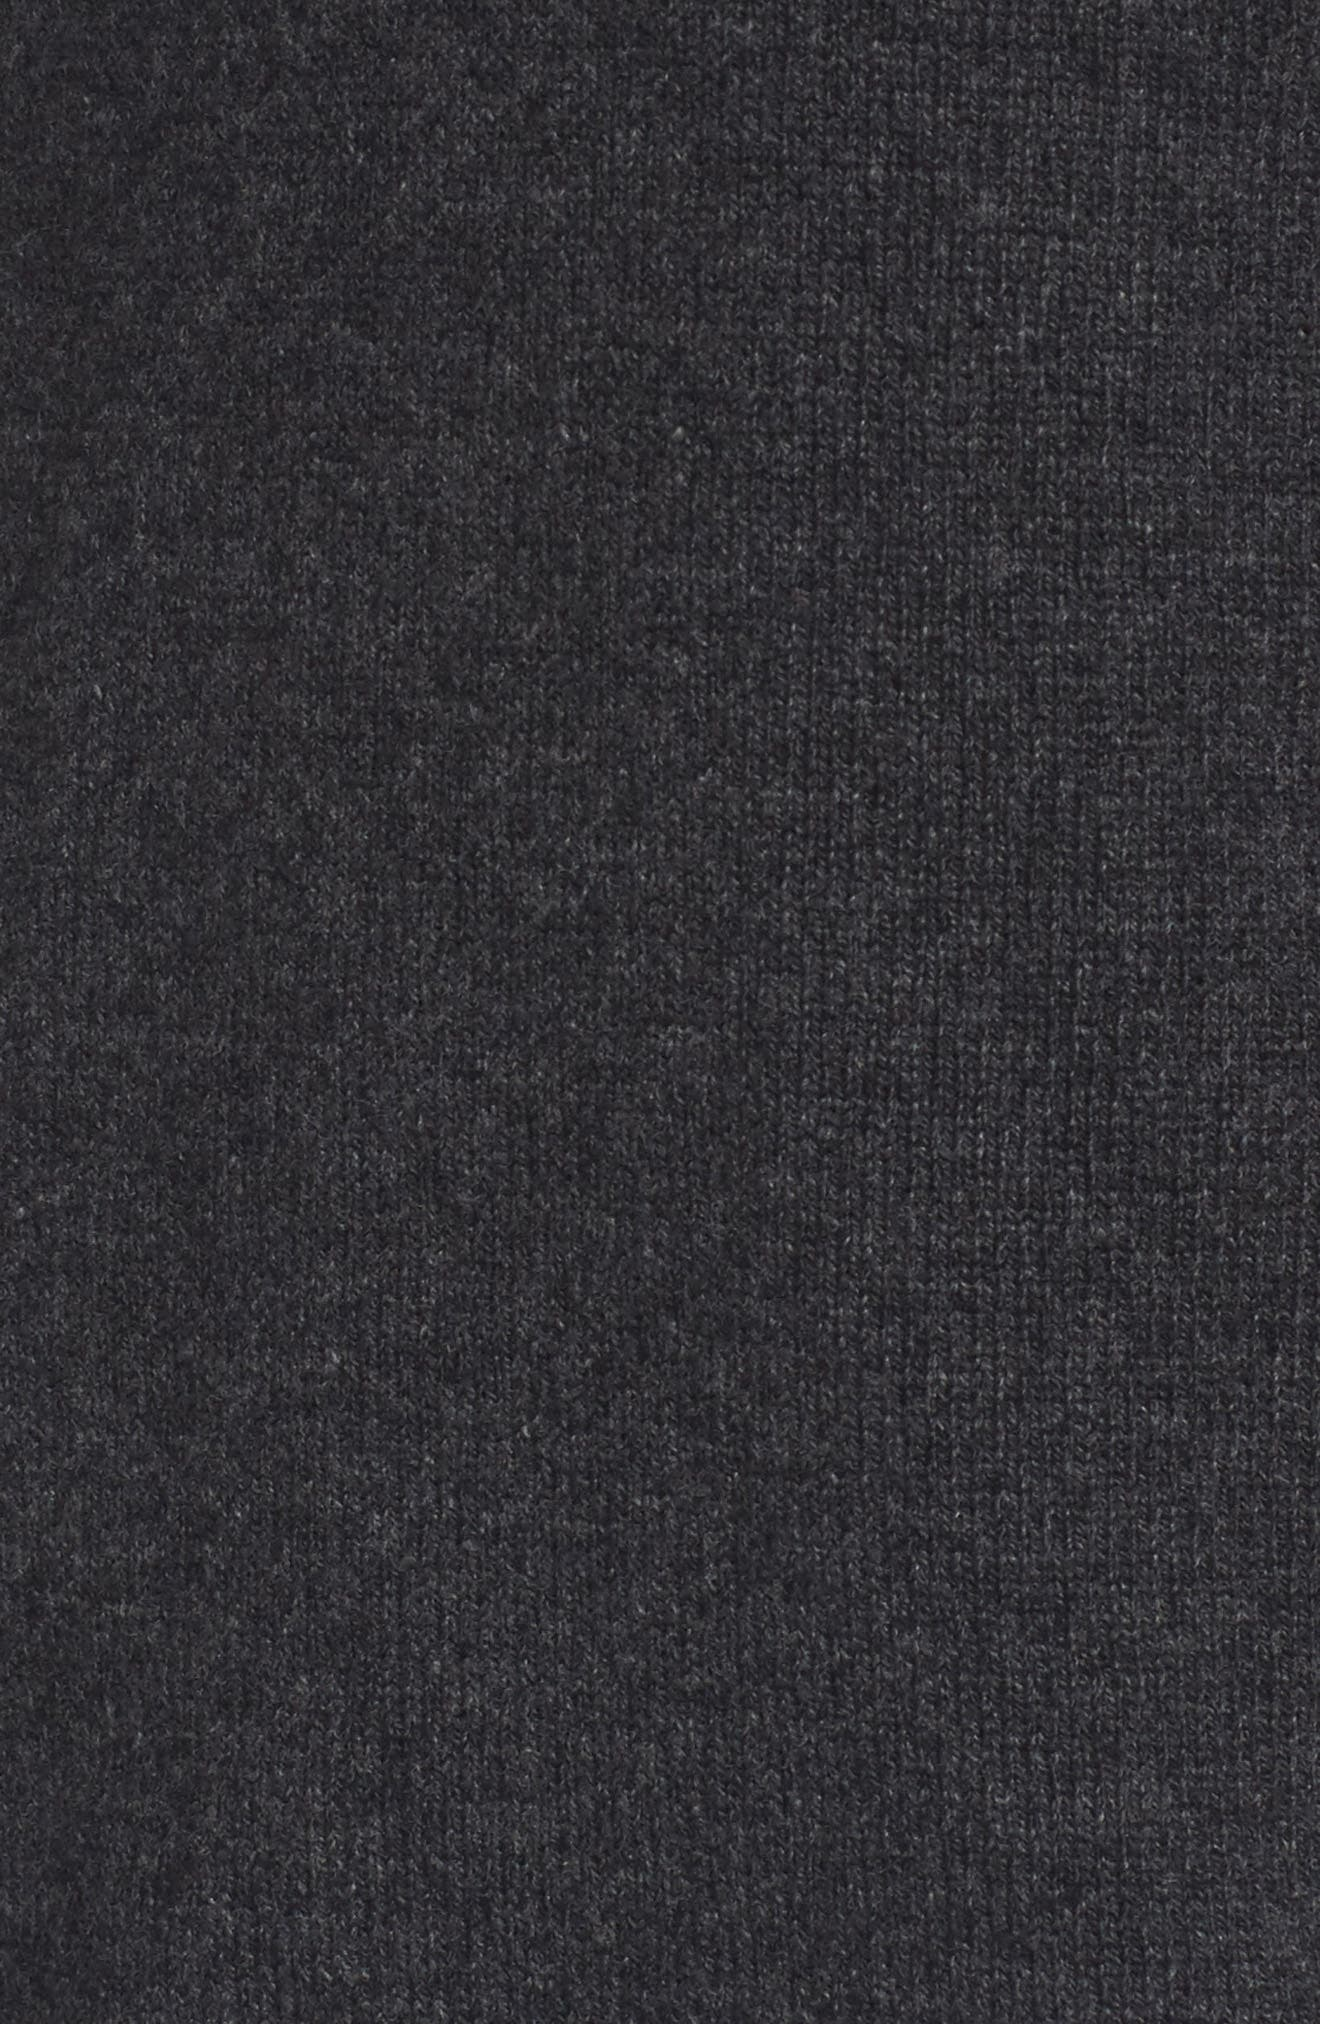 Wool Blend Quarter Zip Sweater,                             Alternate thumbnail 5, color,                             Dark Grey